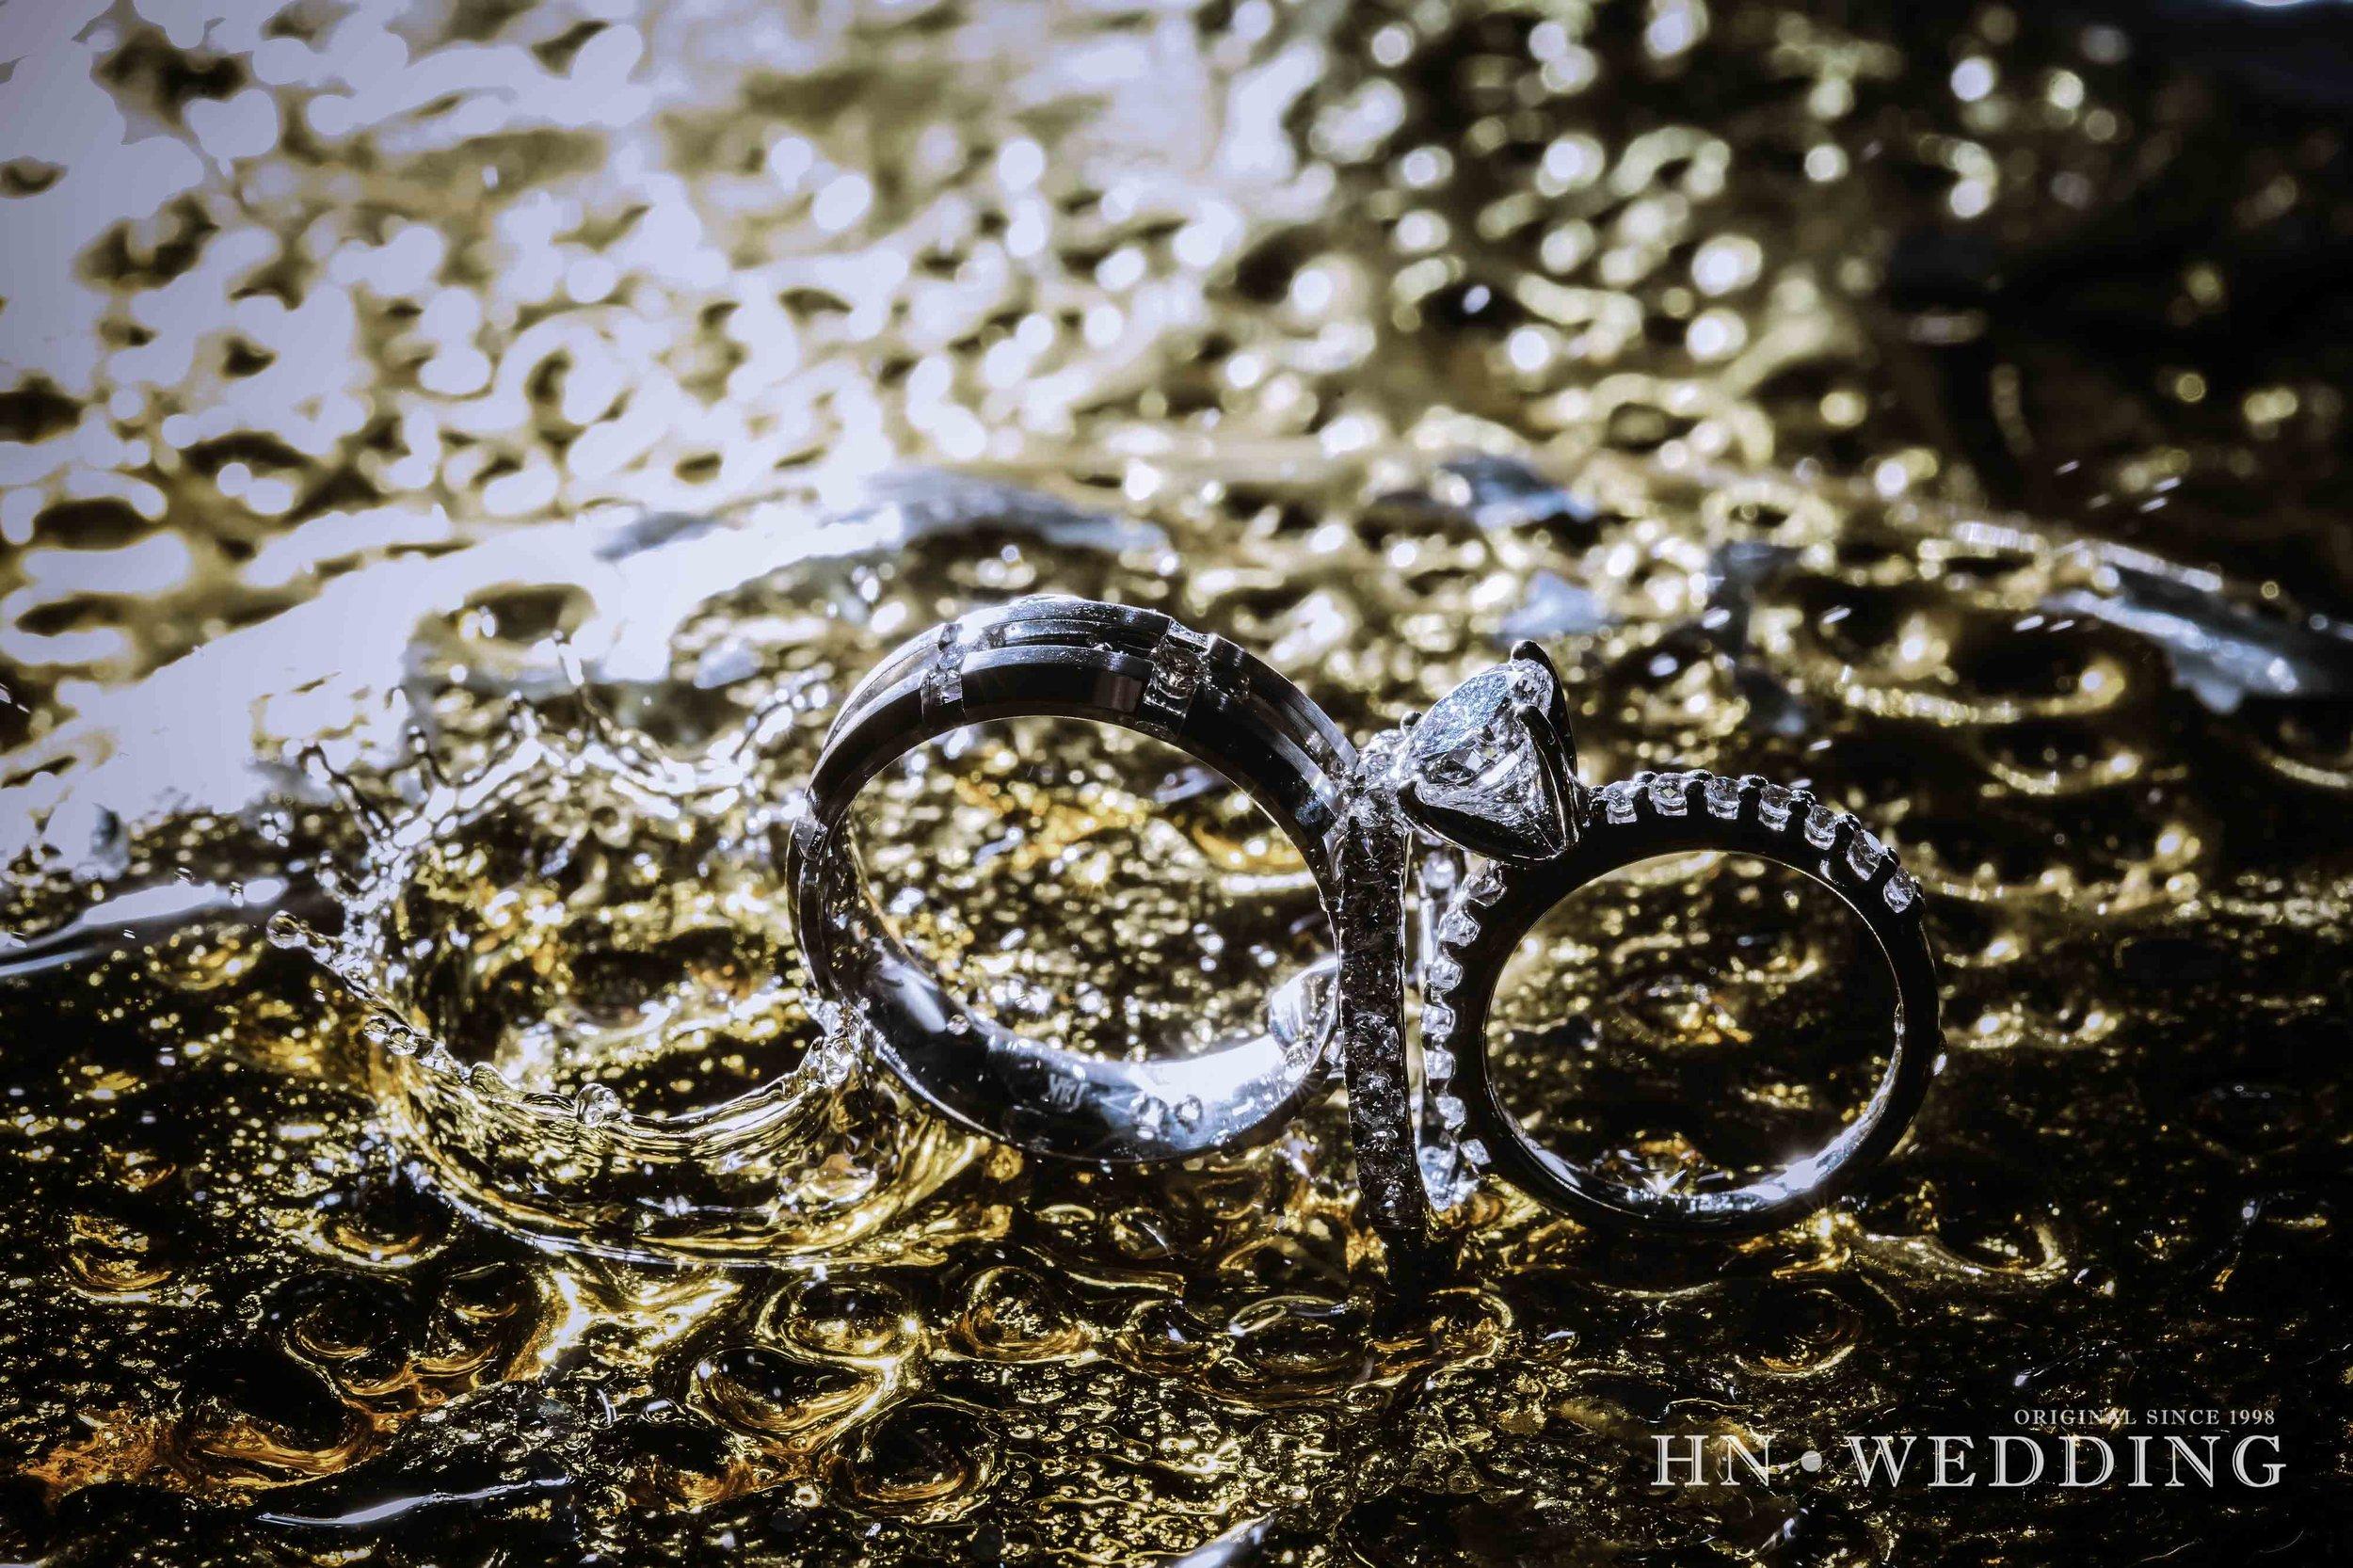 HNwedding-20160822-wedding-6589.jpg